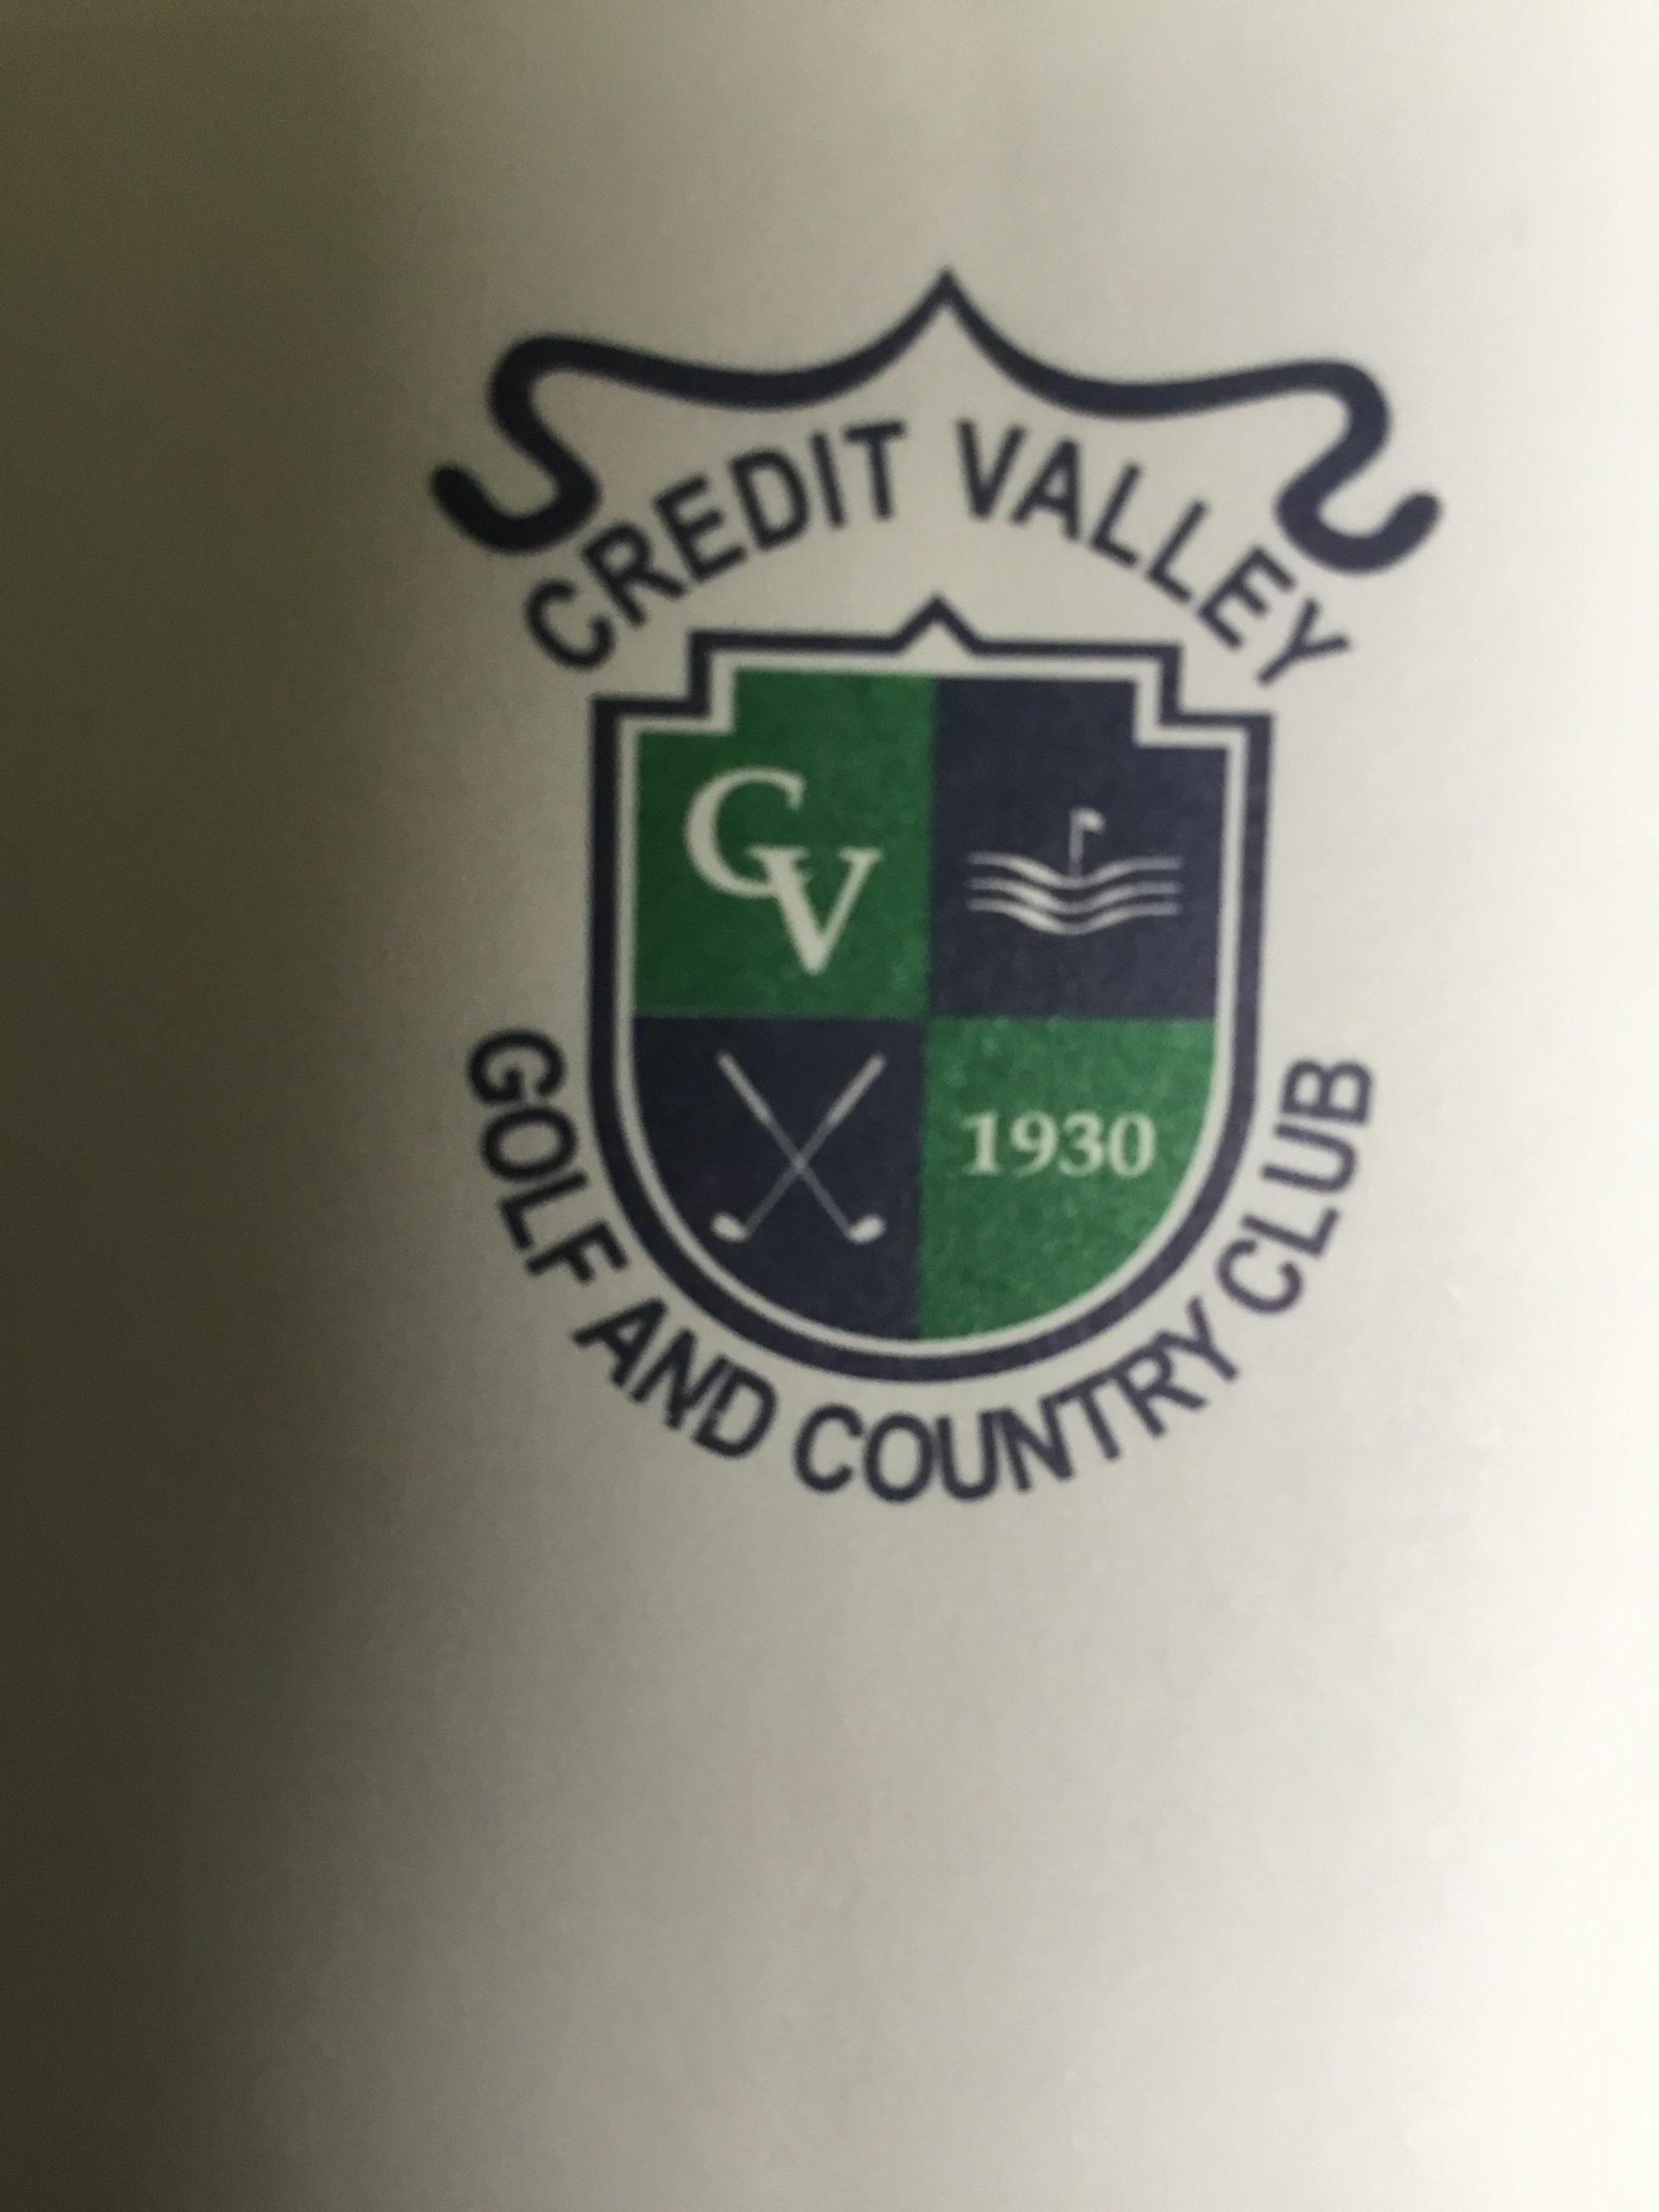 Credit Valley Golf image